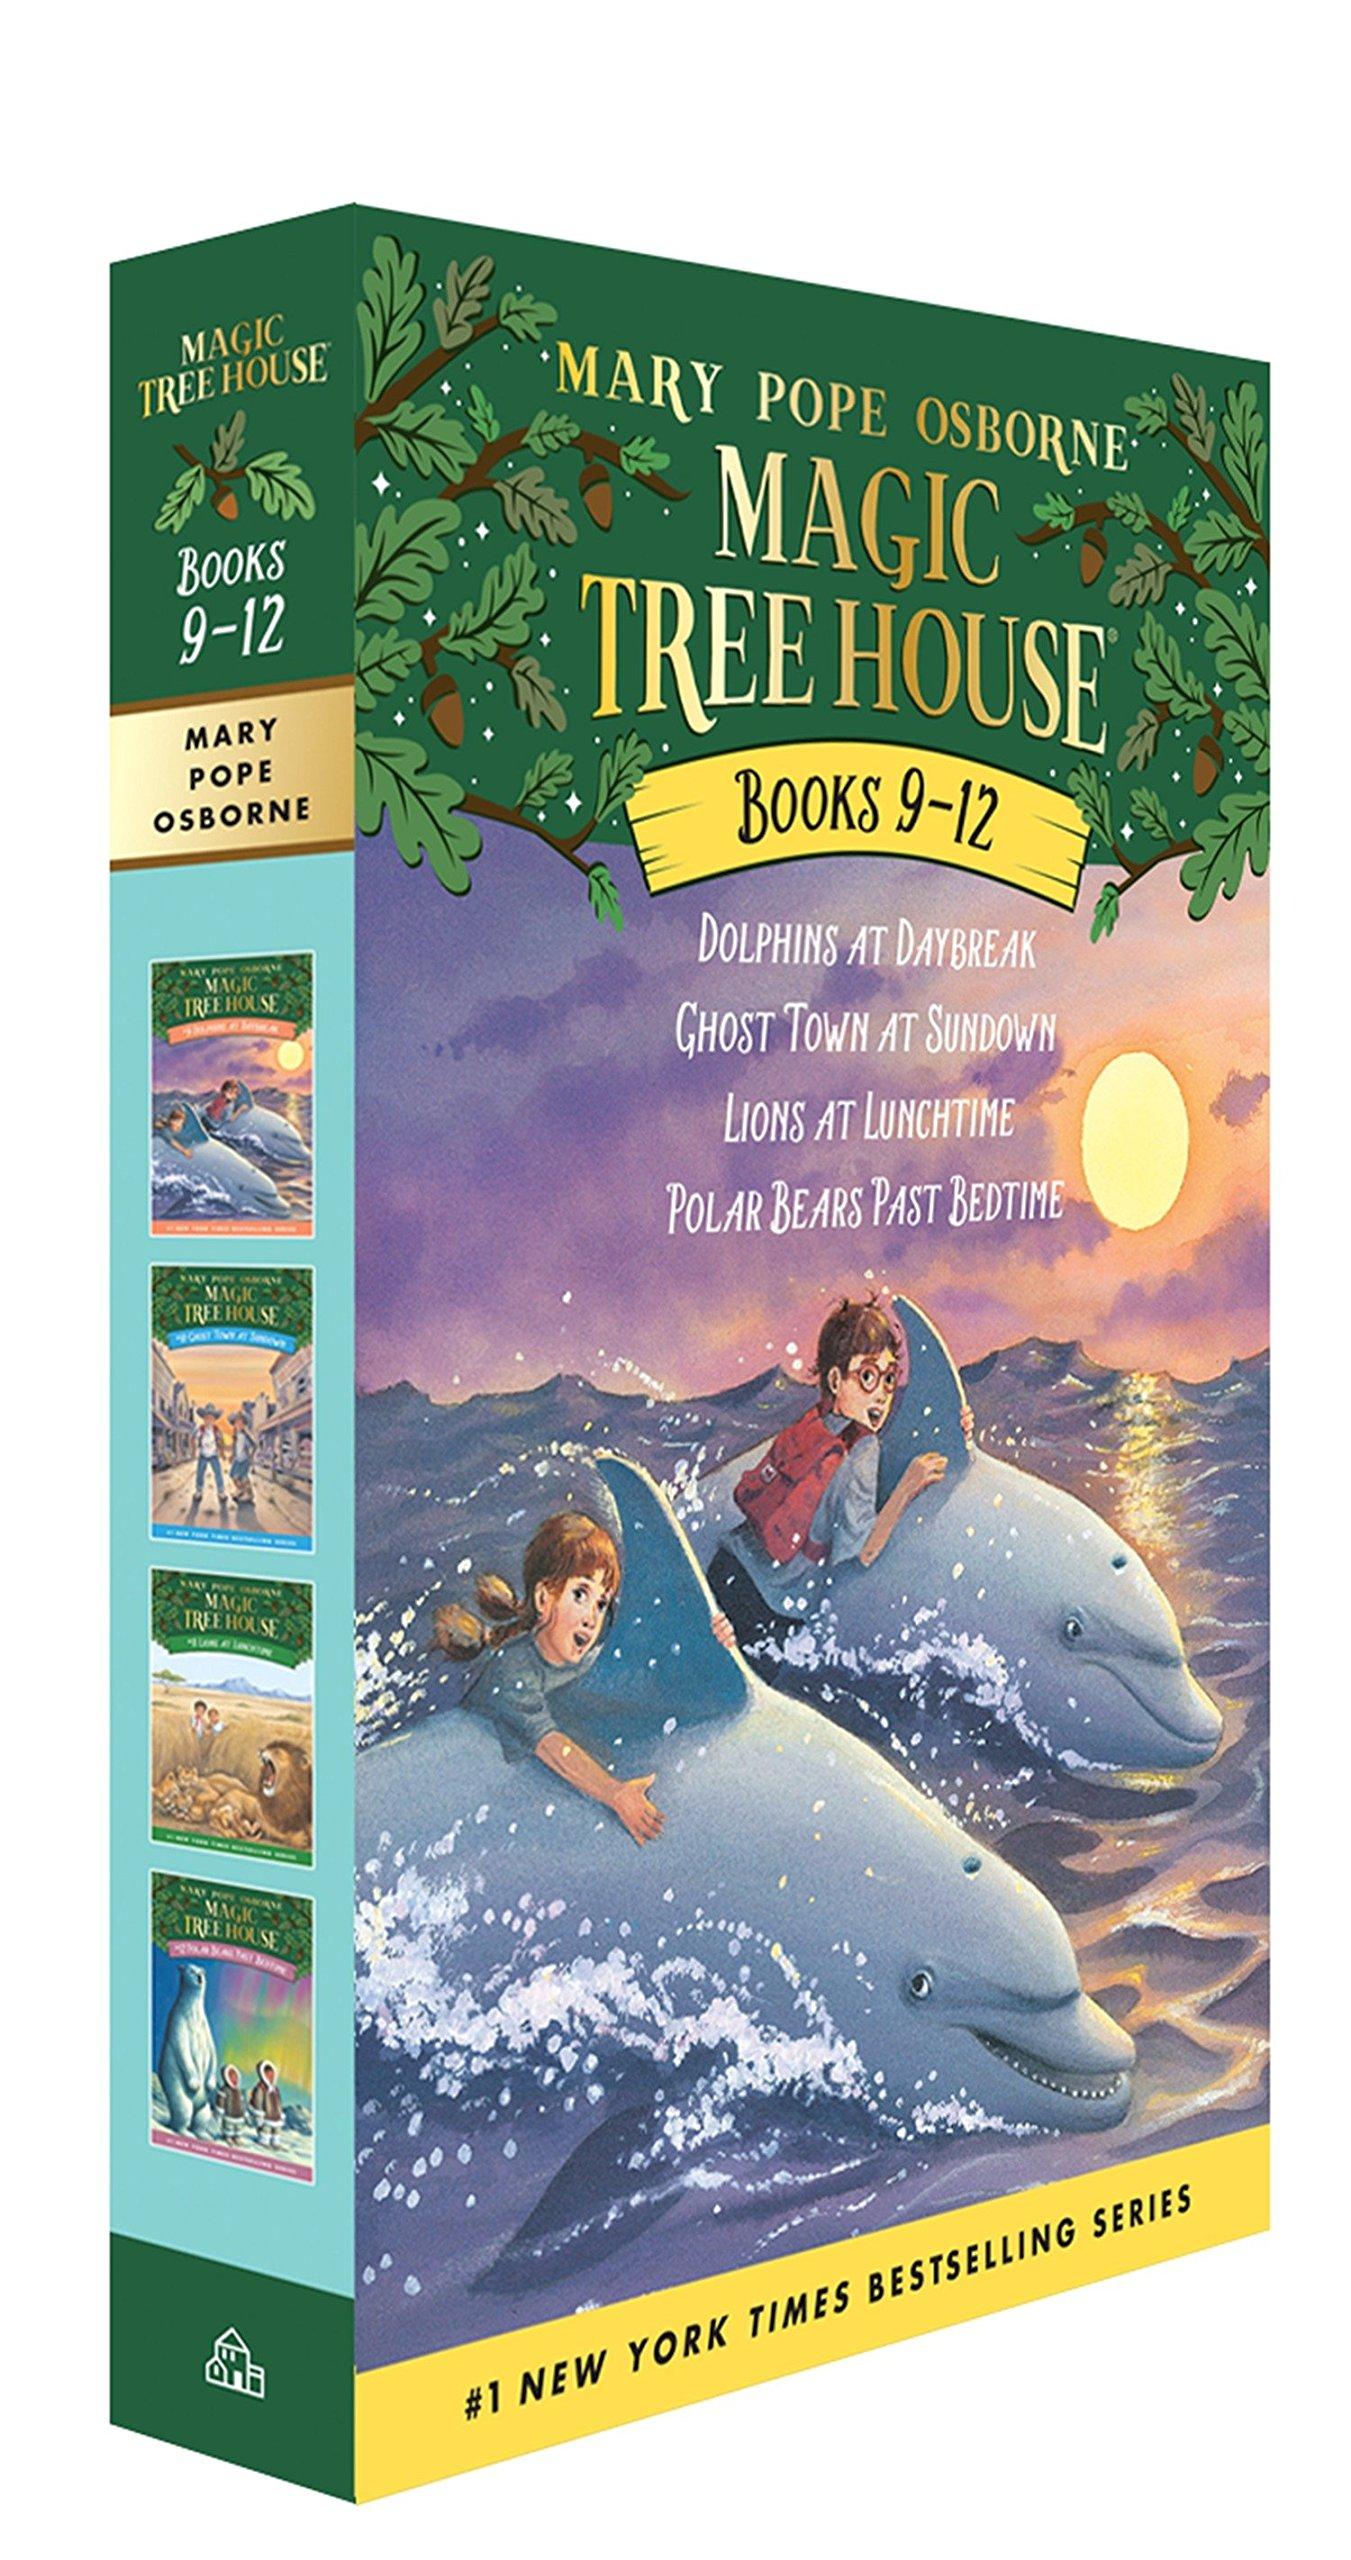 Magic Tree House Volumes 9-12 Boxed Set: Books 9-12 (Magic Tree House (R))